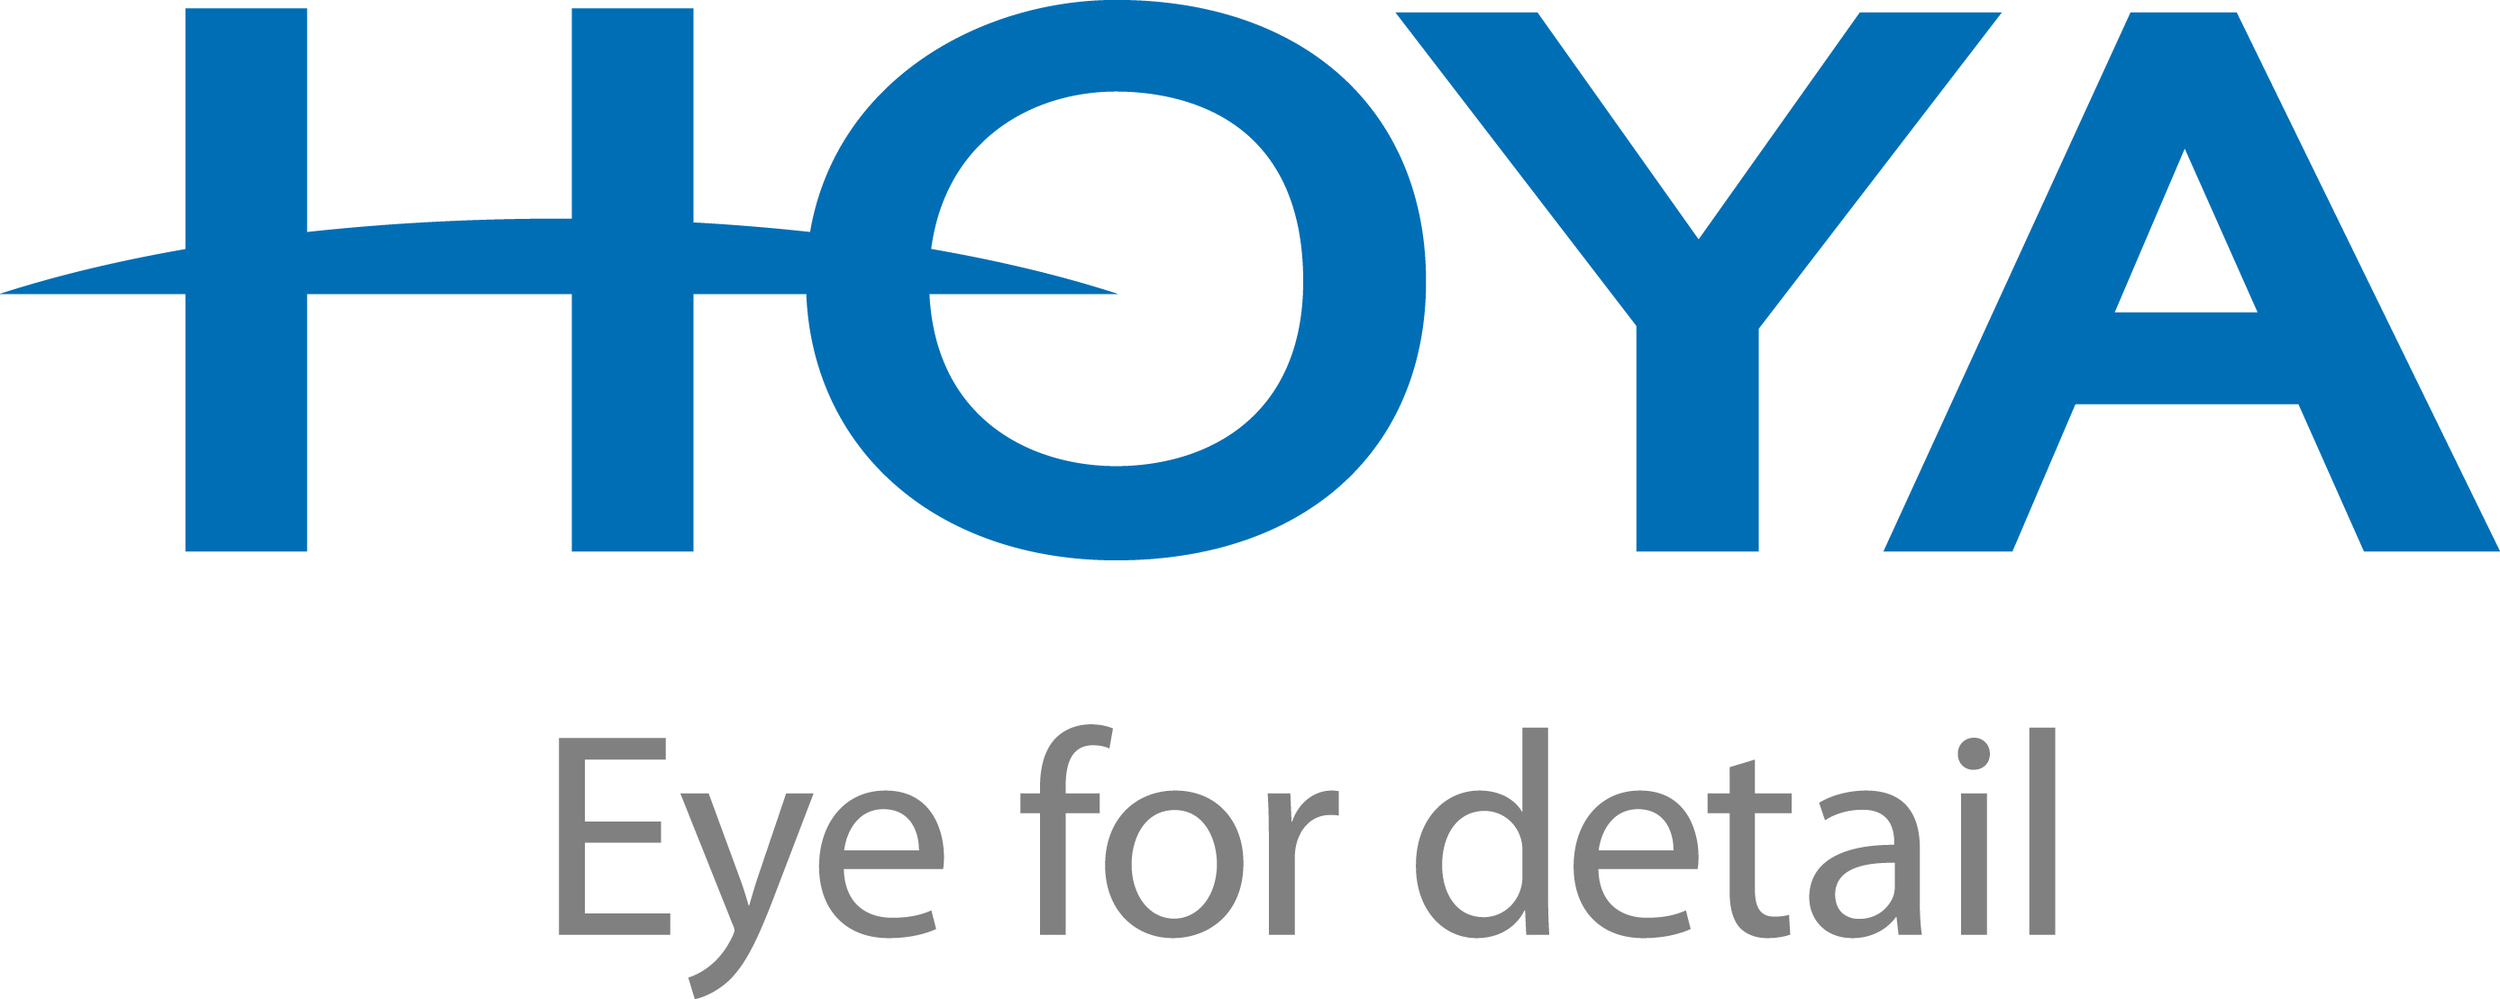 HOYA Vision Care Europe